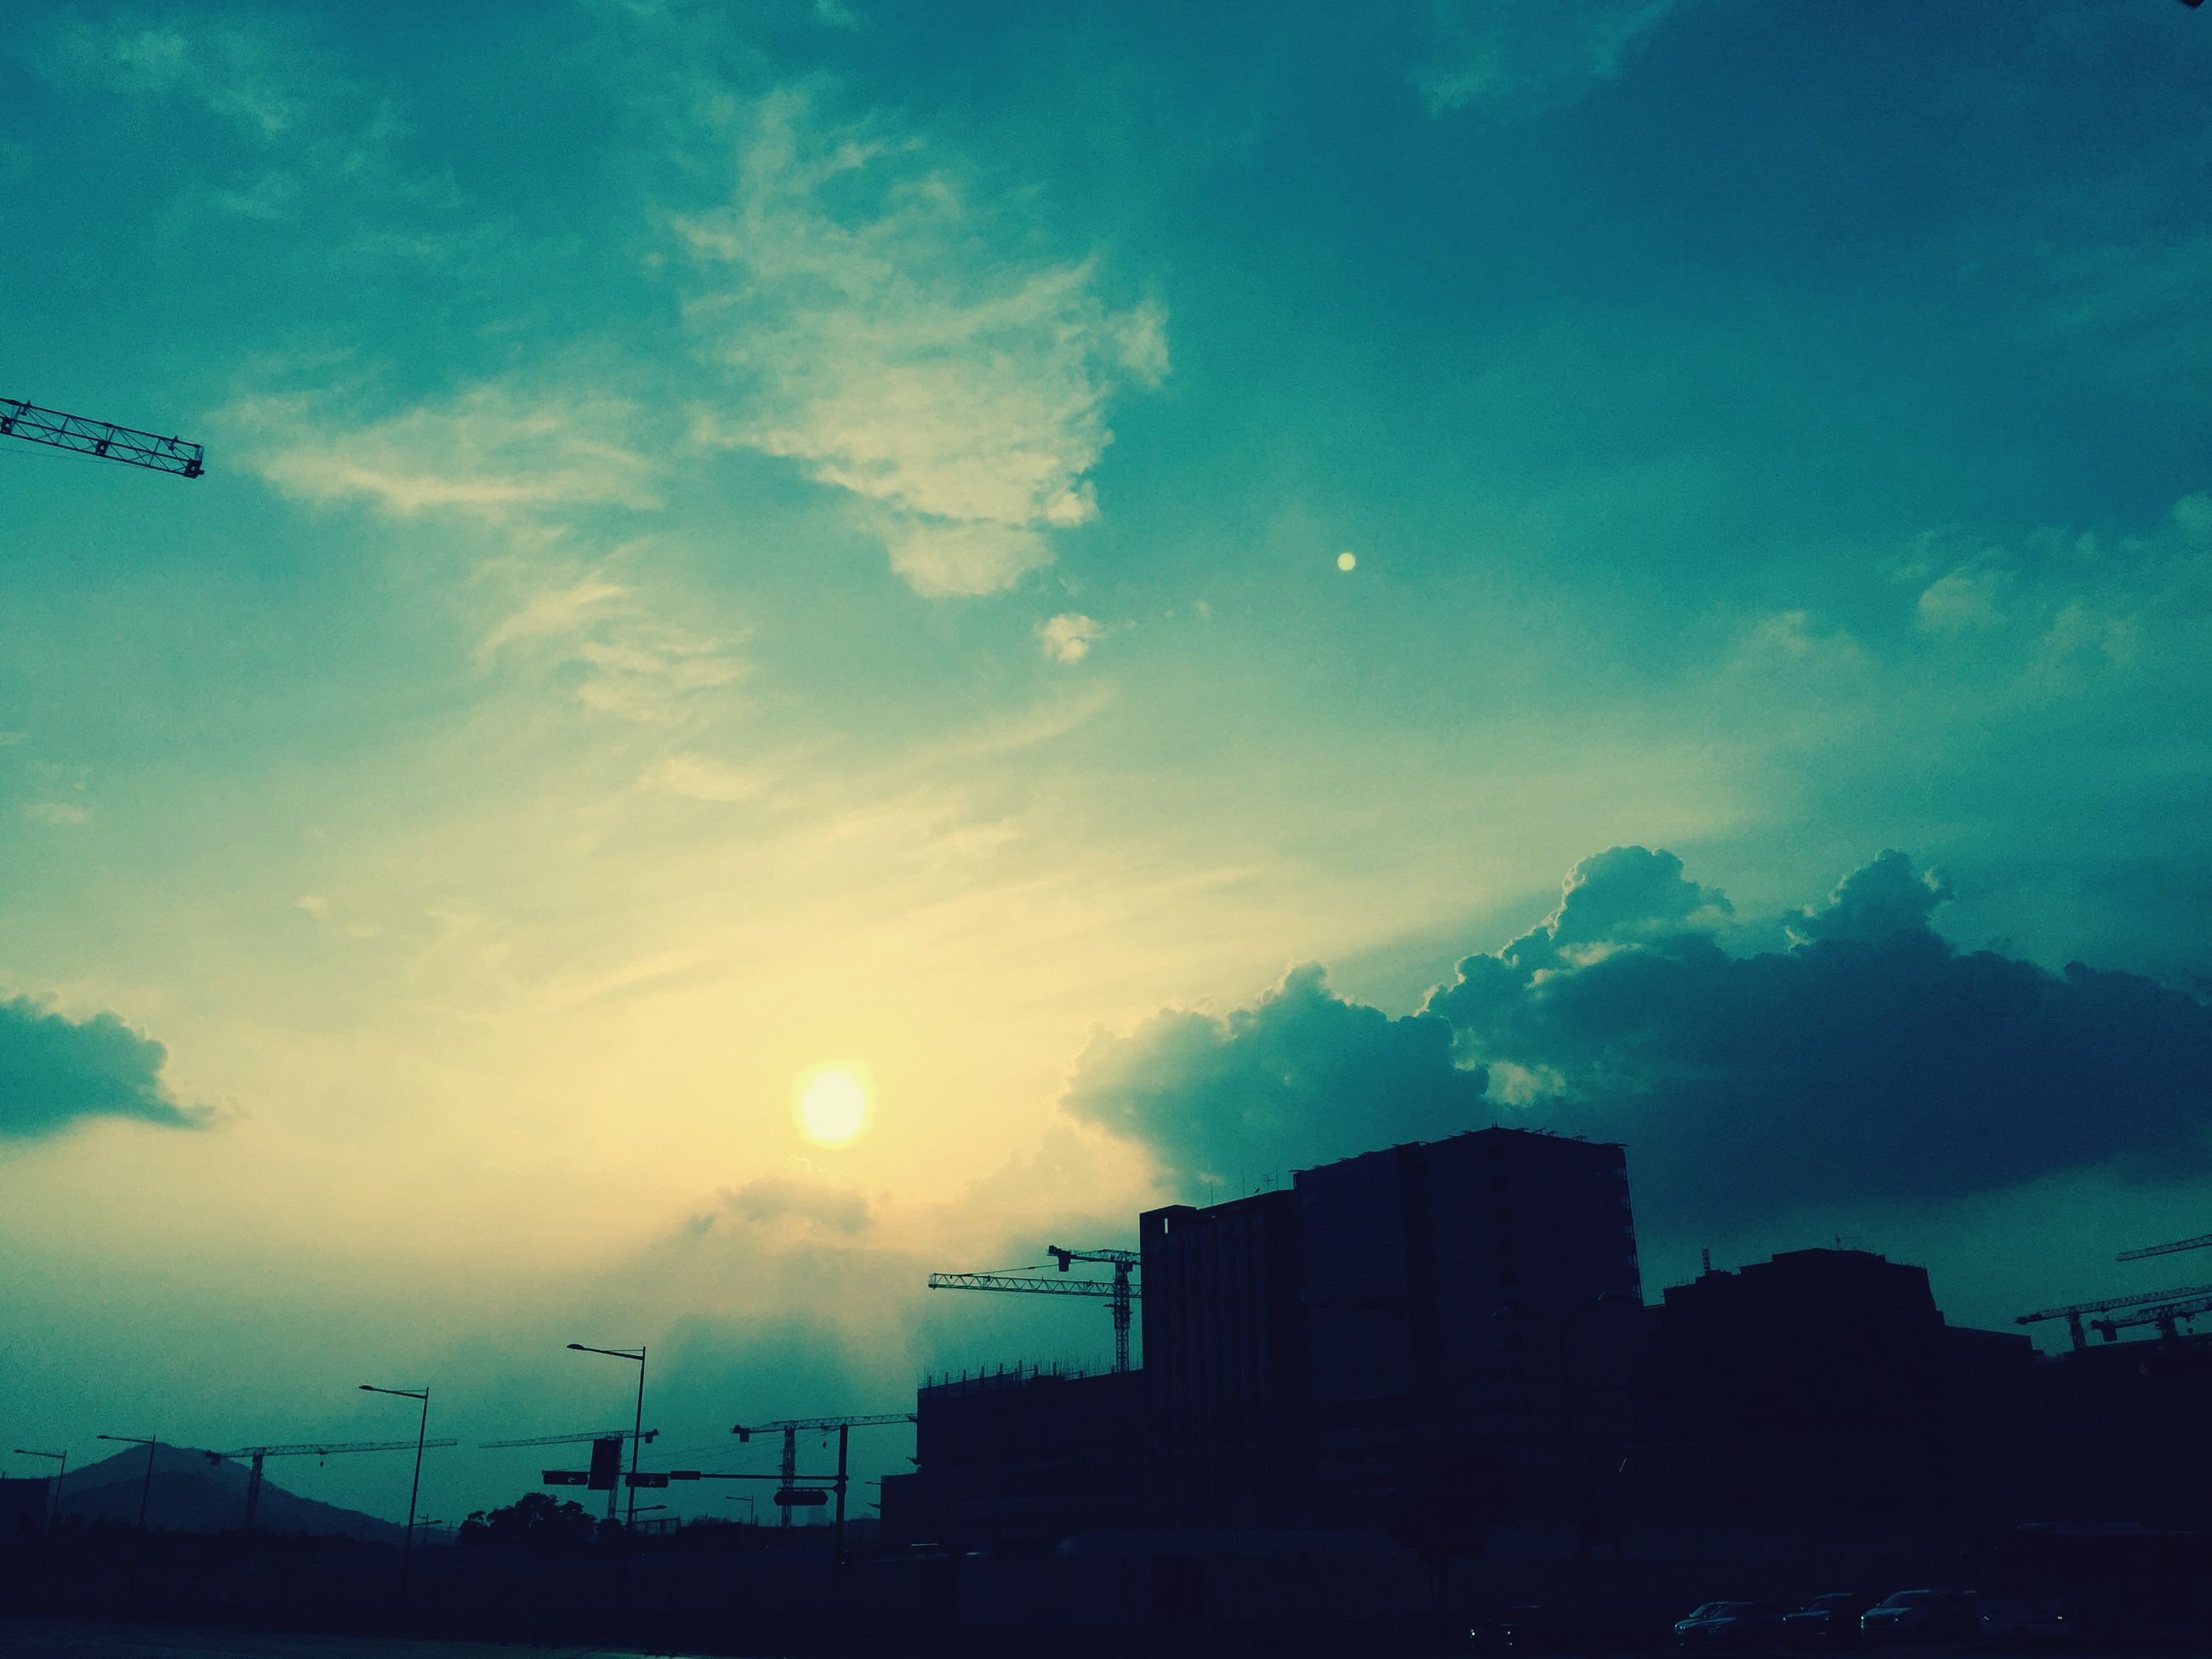 building exterior, architecture, built structure, sky, silhouette, sunset, cloud - sky, sun, city, low angle view, cloud, sunlight, building, blue, dusk, outdoors, nature, residential building, sunbeam, no people